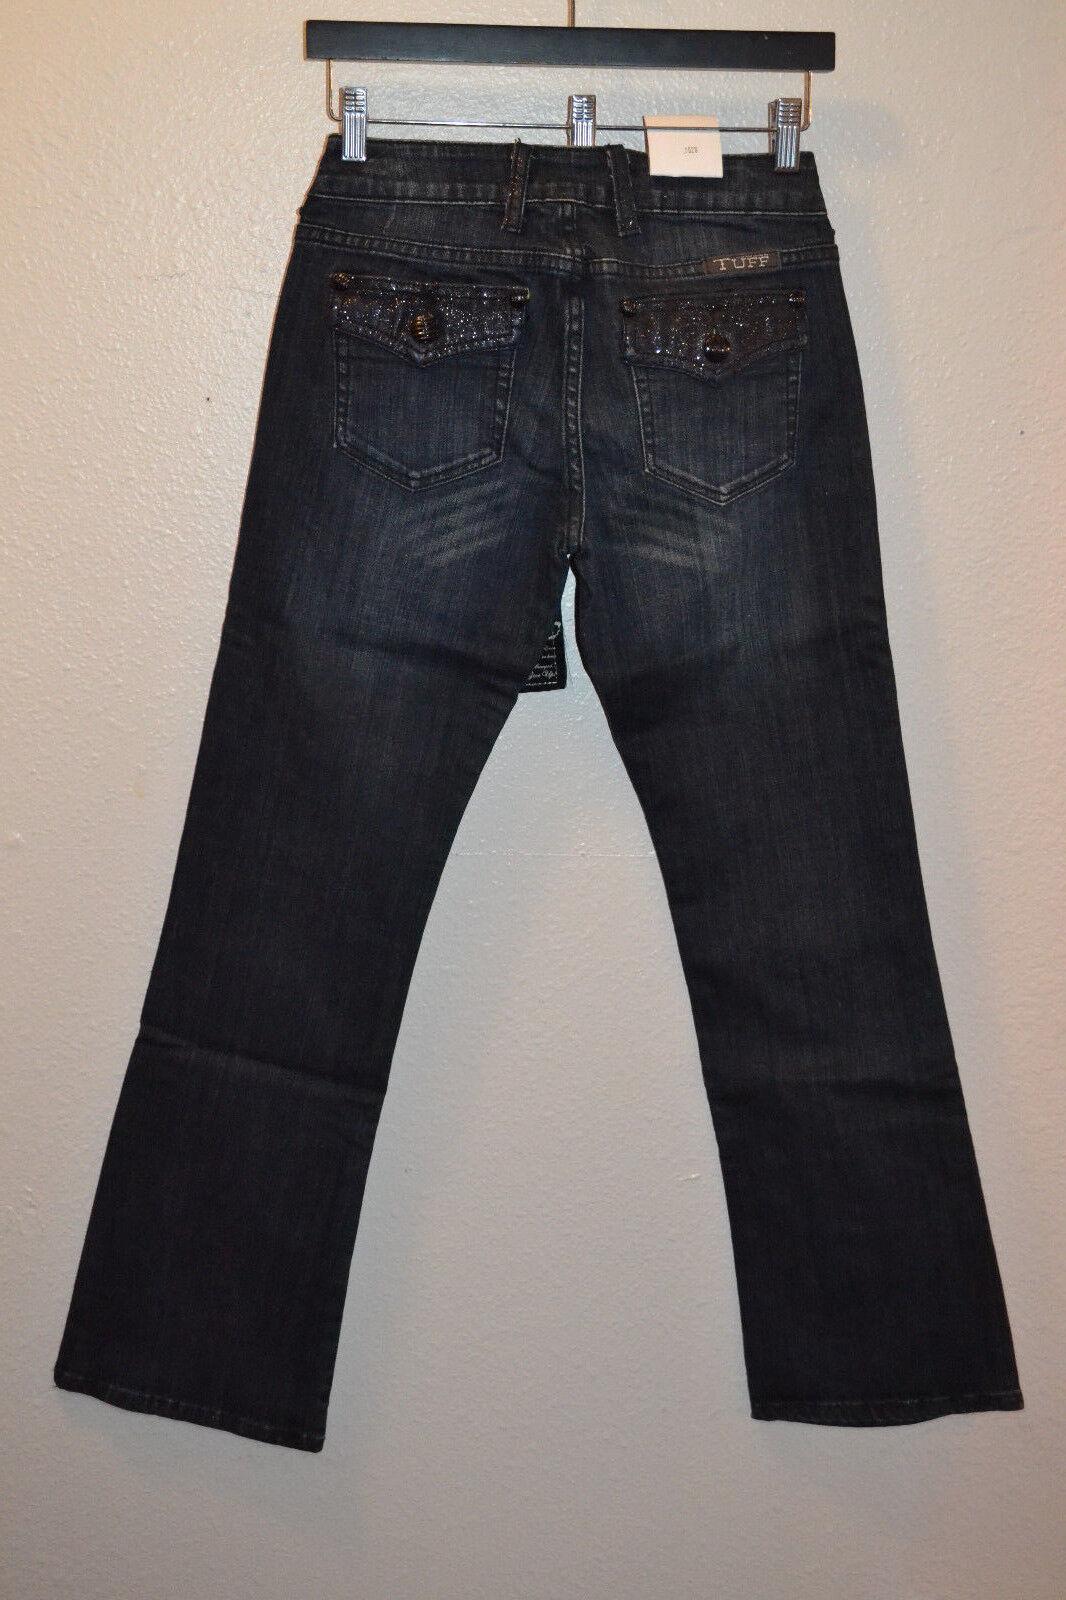 NEW Cowgirl Tuff Jeans 32 x 35 Glitter Bronc Dark Wash Midrise Boot Cut Western